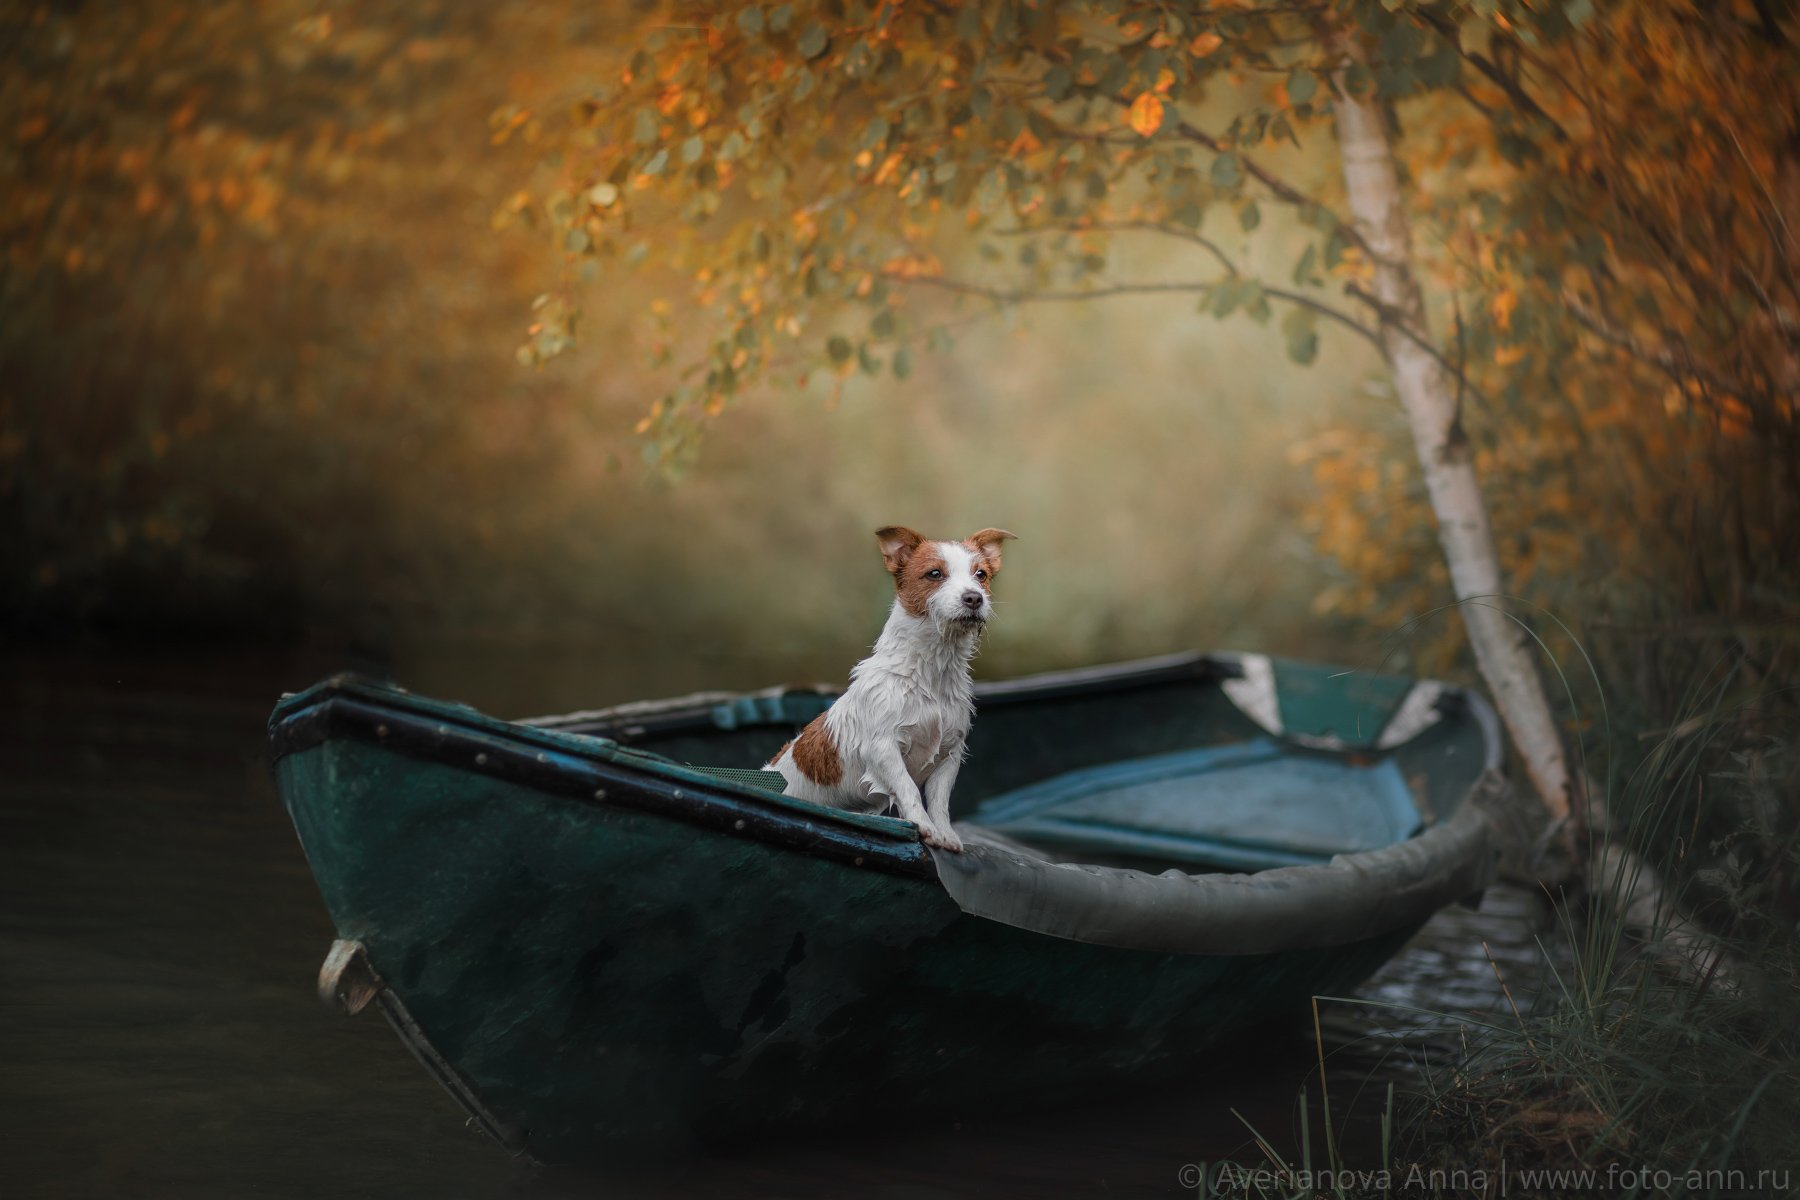 собака, природа, лодка, Анна Аверьянова